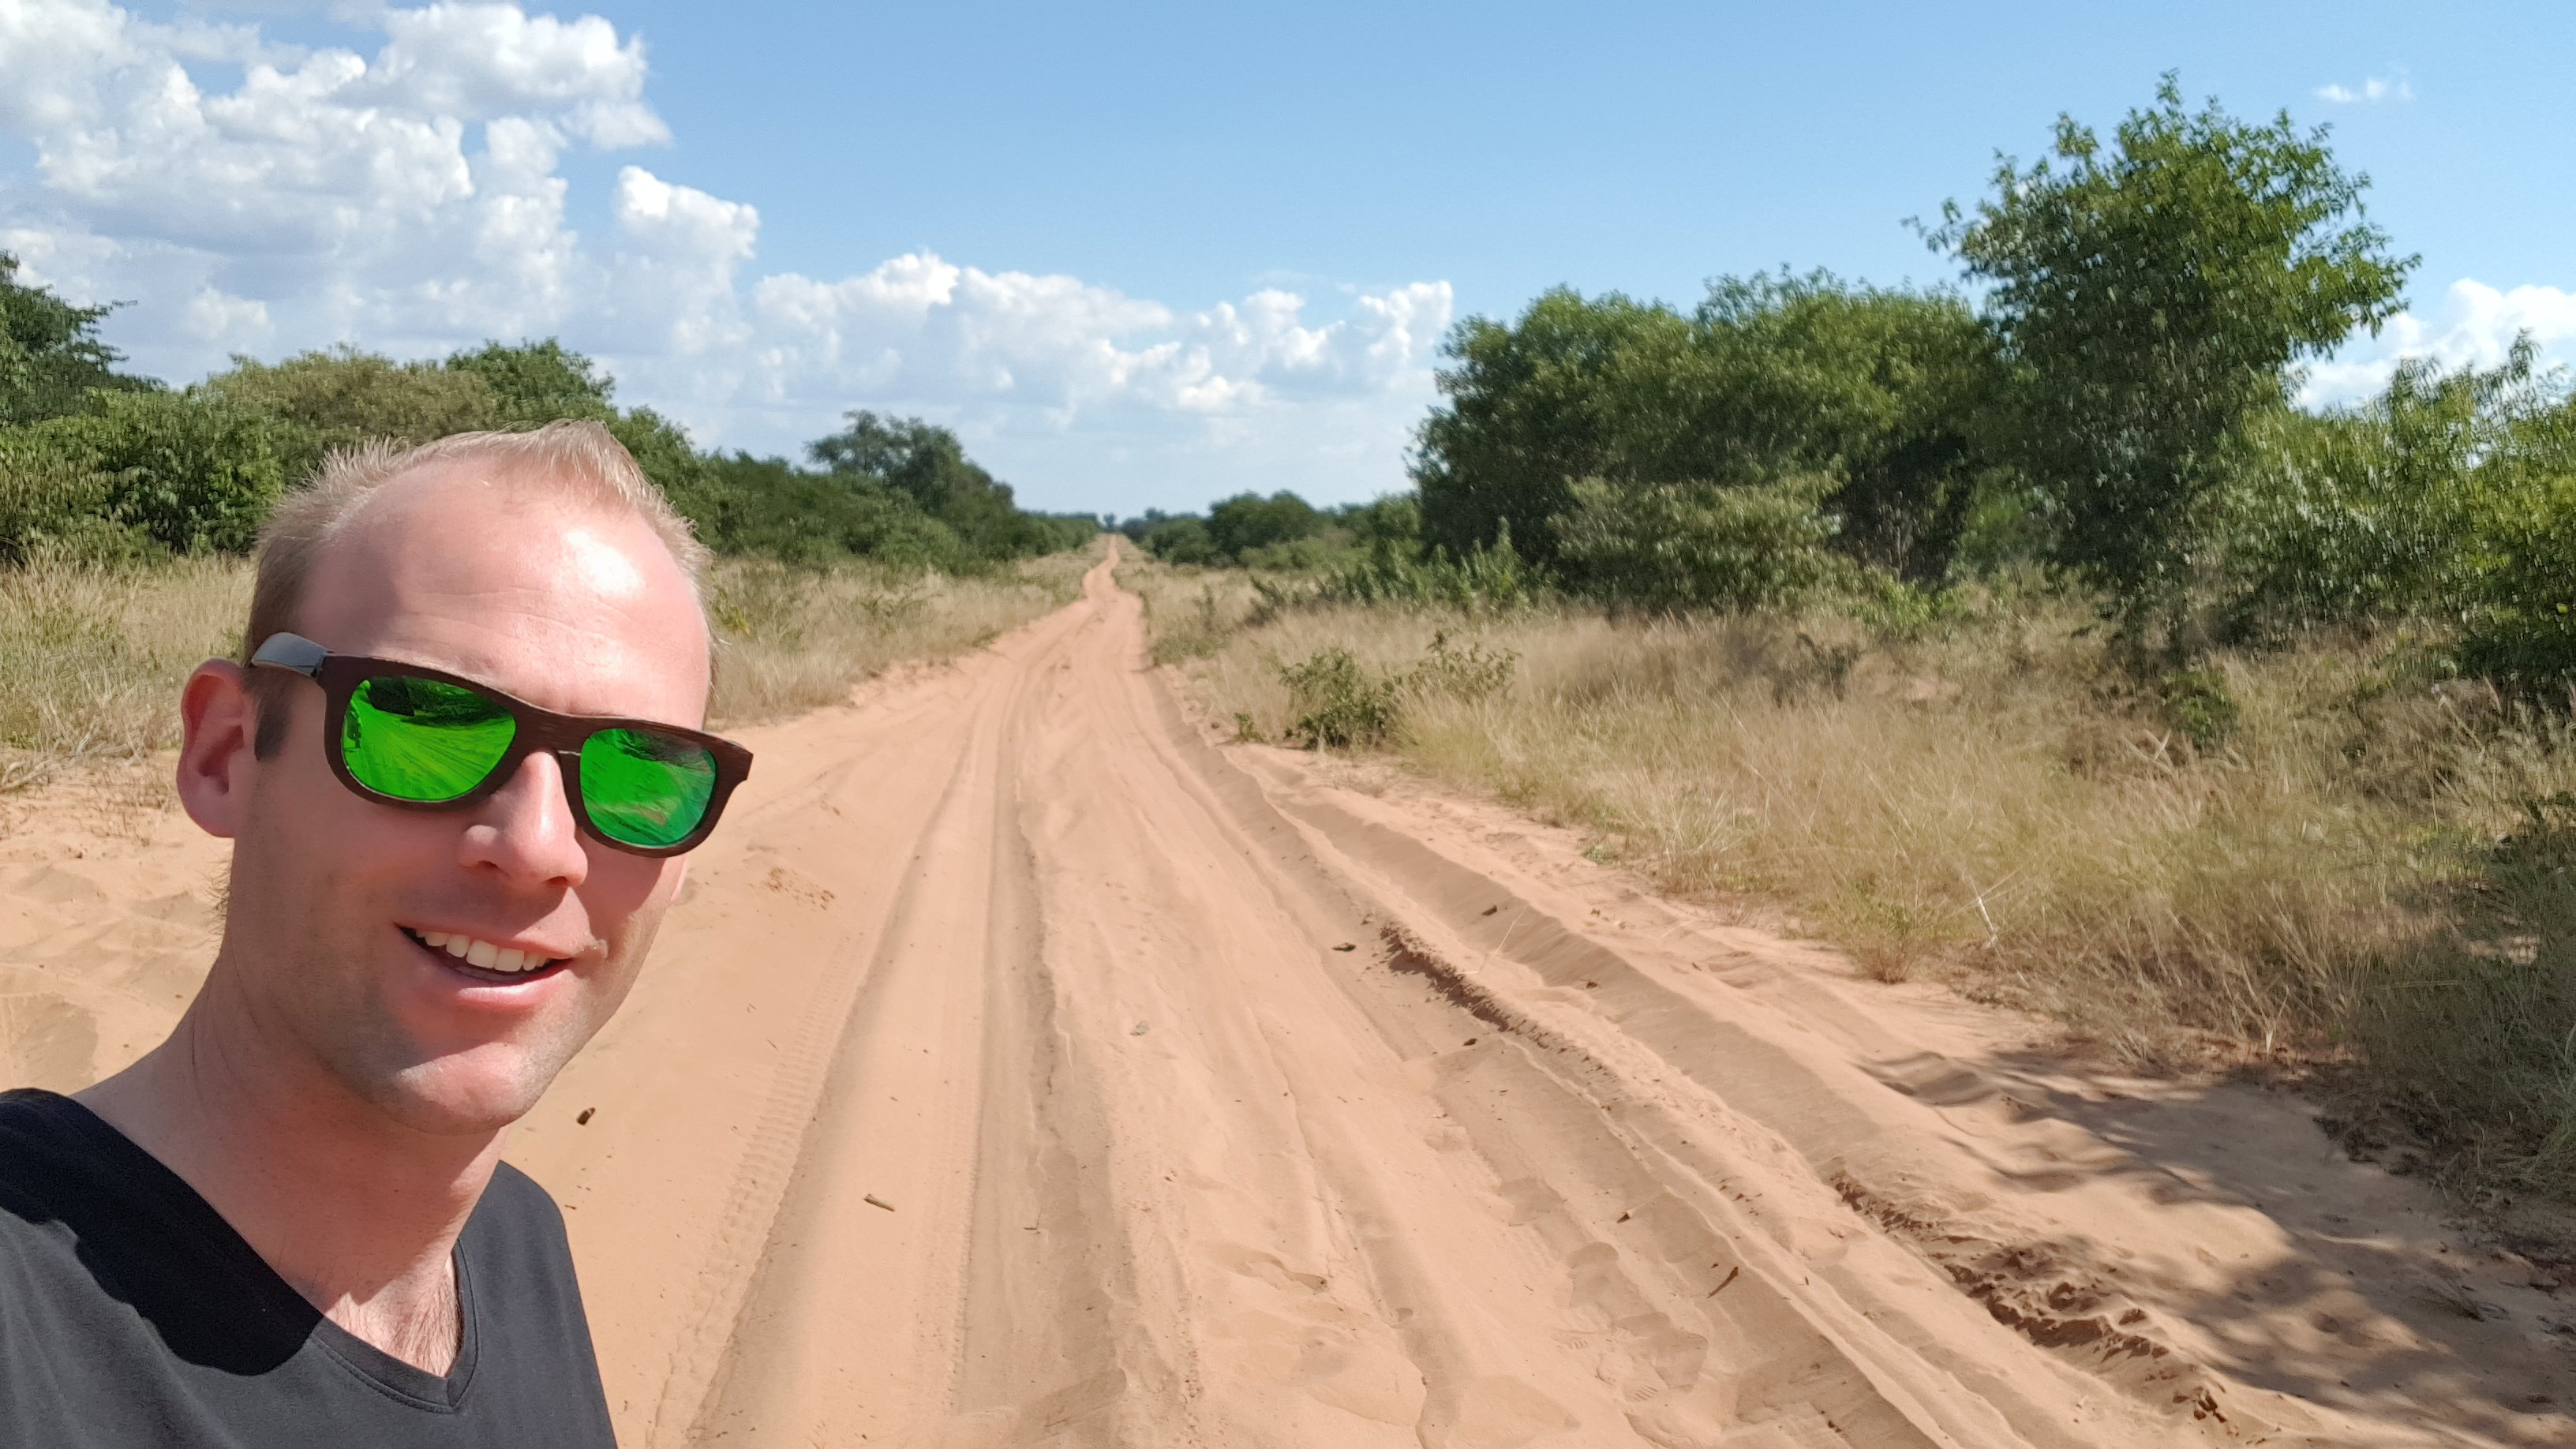 Martijn in Namibië